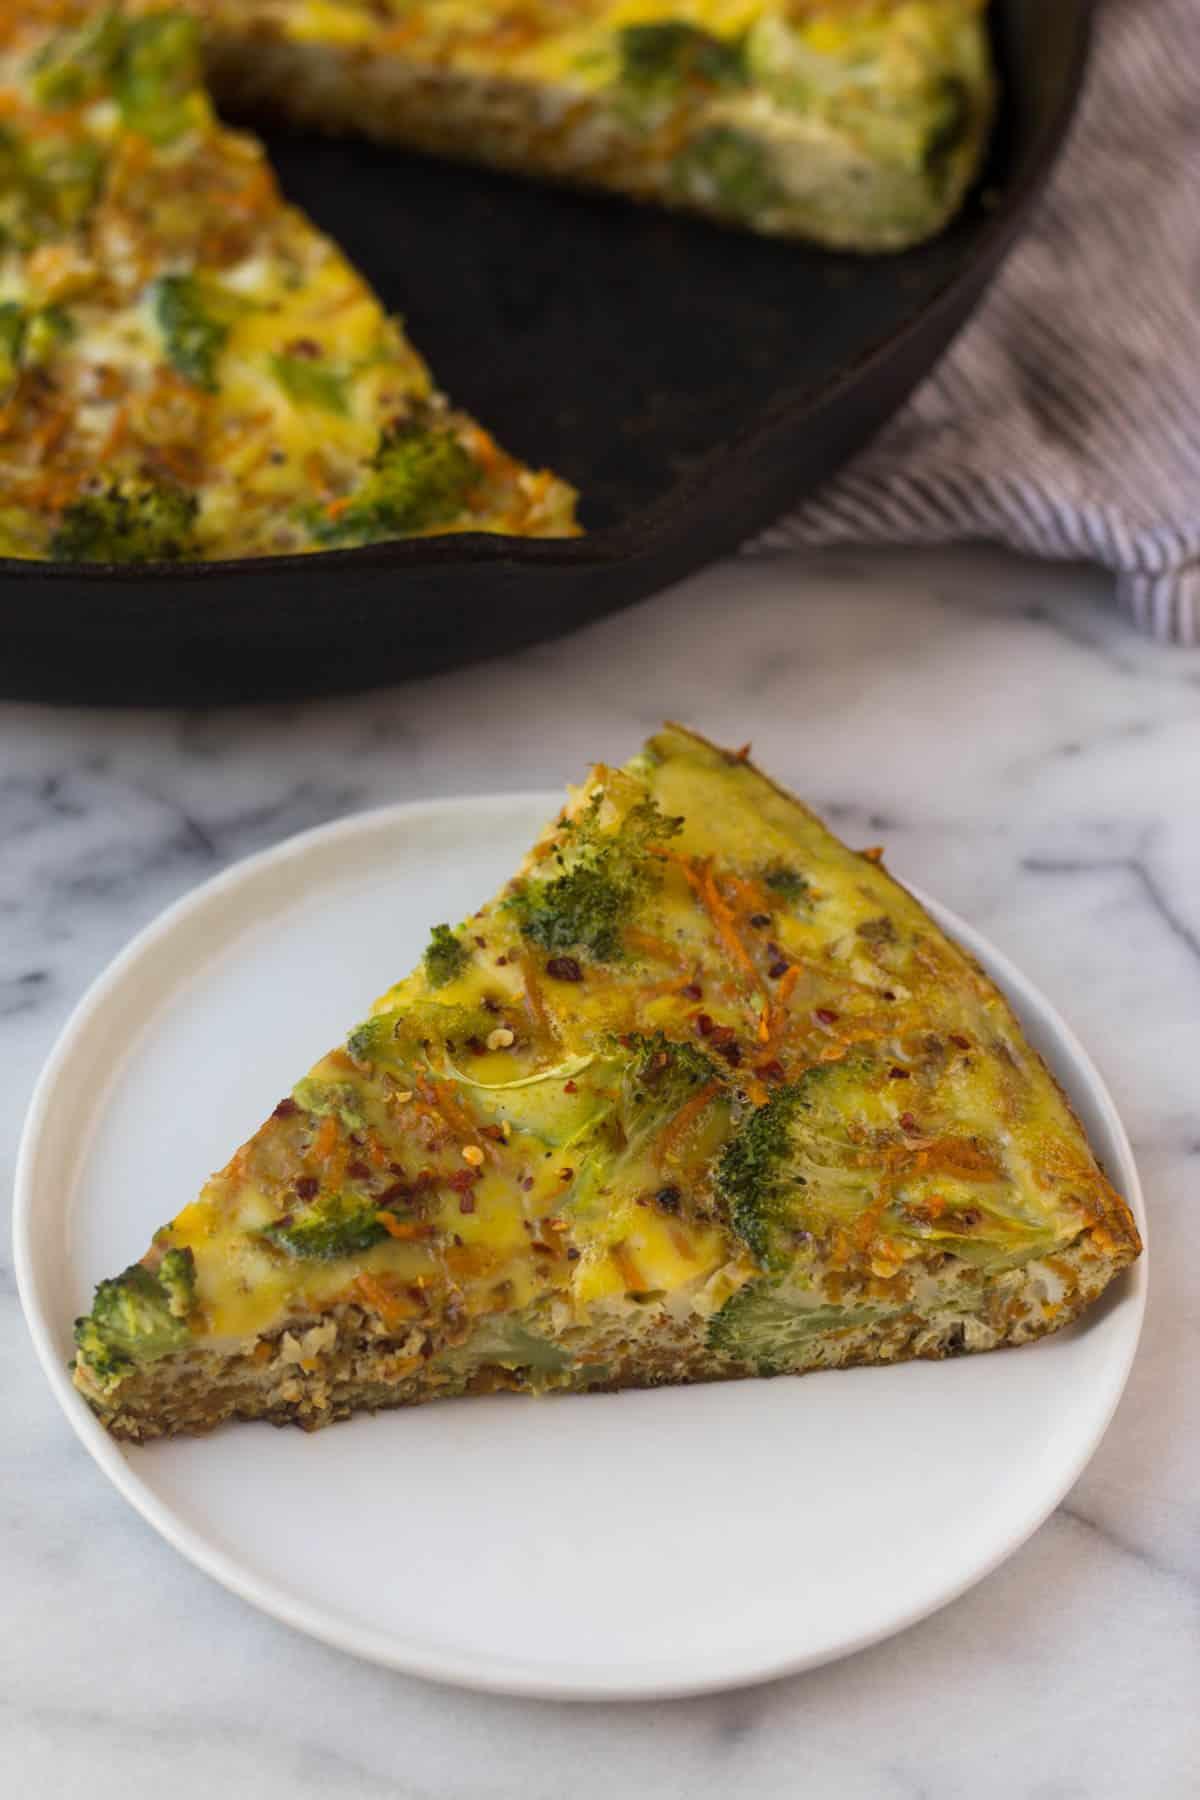 Sweet Potato Broccoli Frittata - Eat the Gains